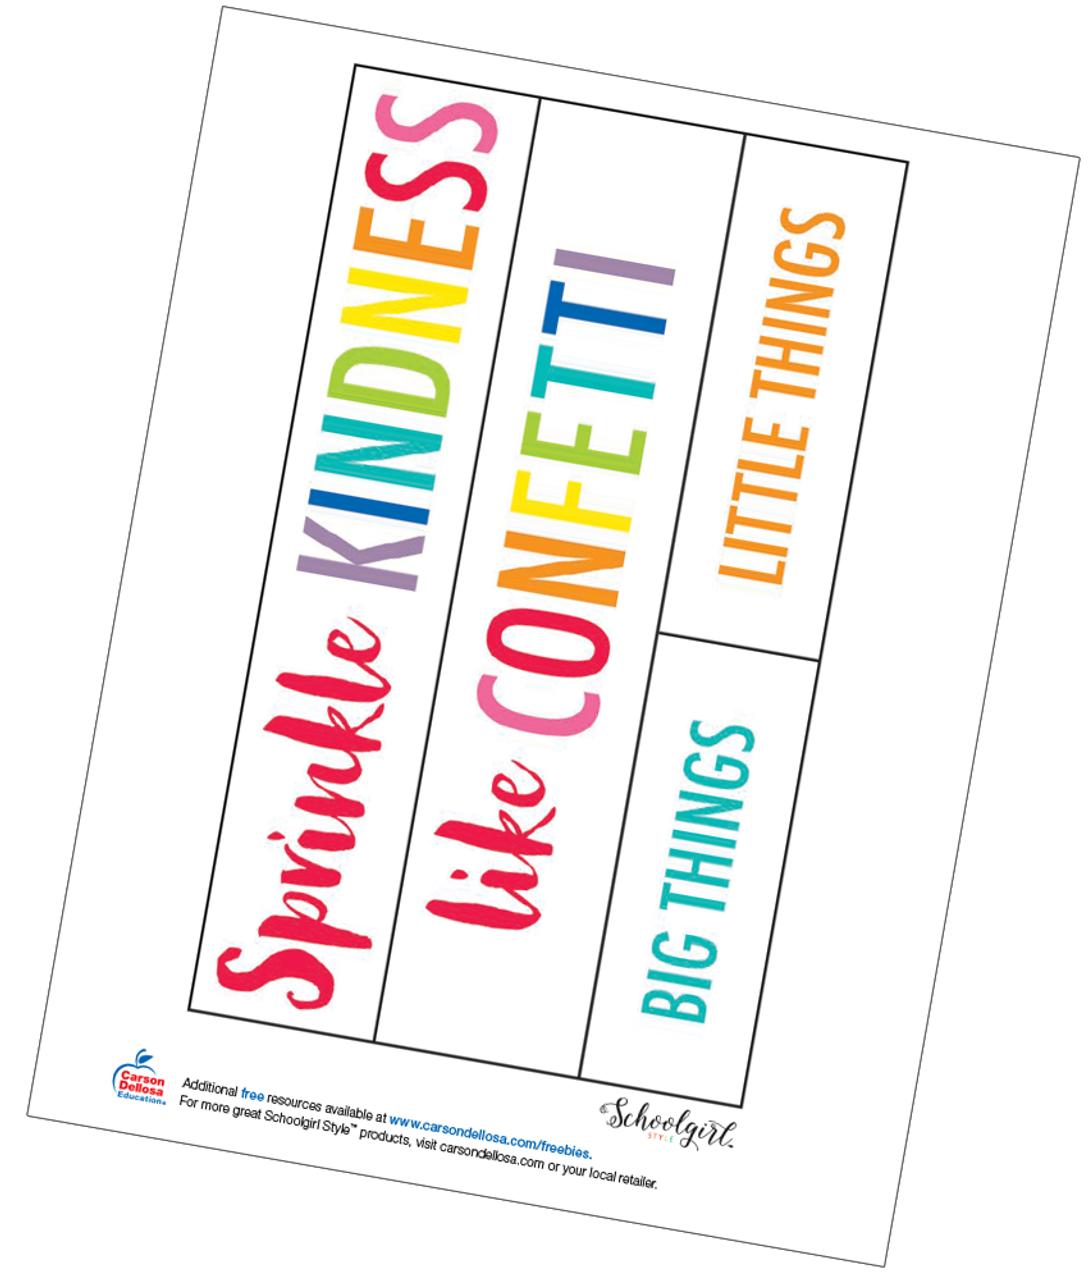 photo regarding Printable Anchor known as Schoolgirl Design: Anchor Chart Absolutely free Printable - Carson